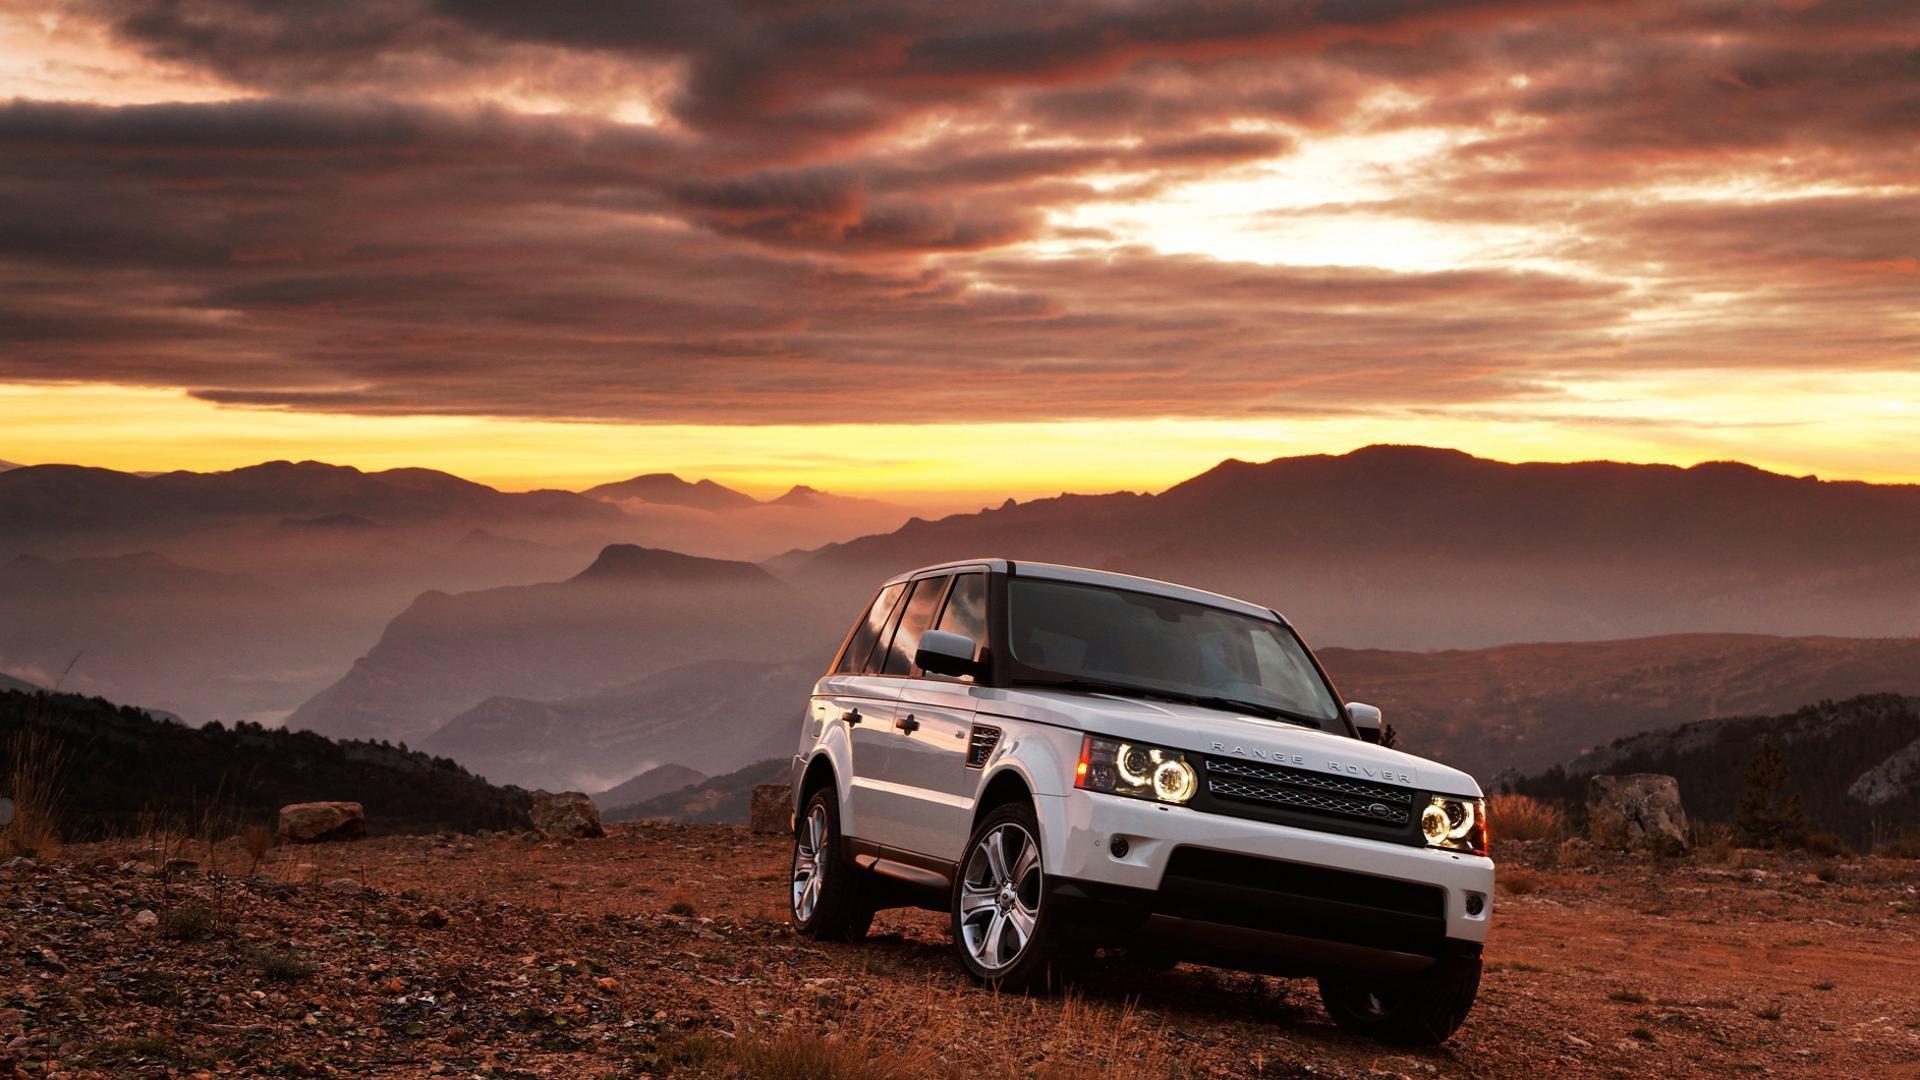 Range Rover Wallpapers 1920x1080 Full HD (1080p) Desktop